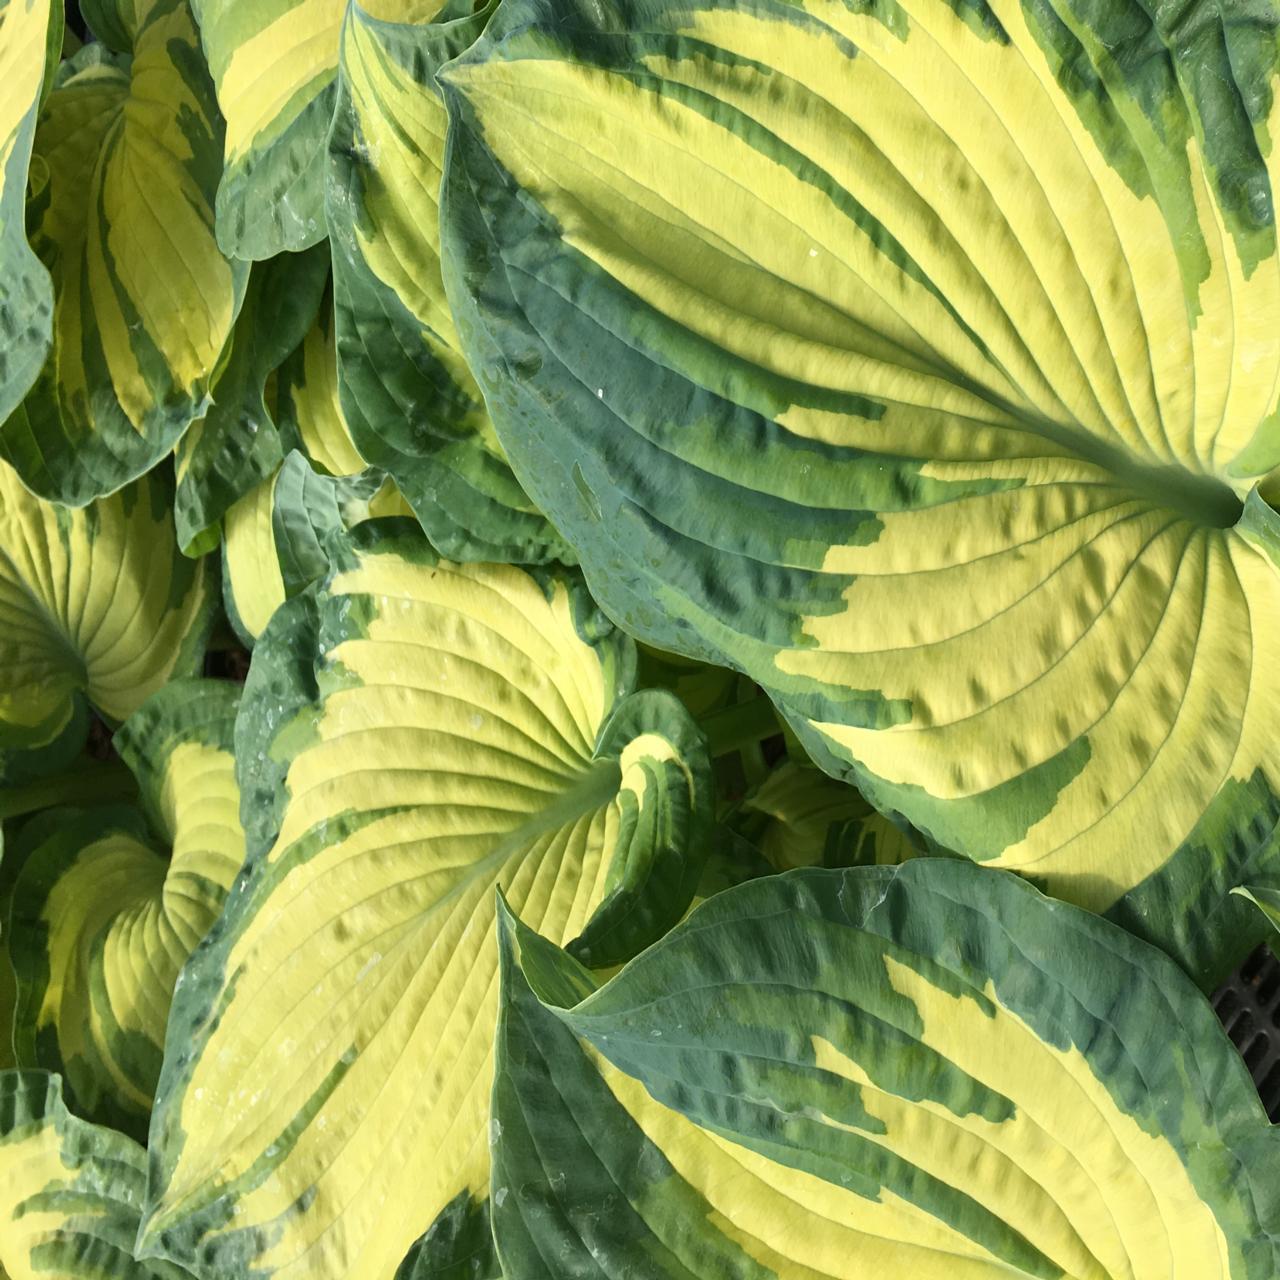 Hosta 'Golden Meadows' plant